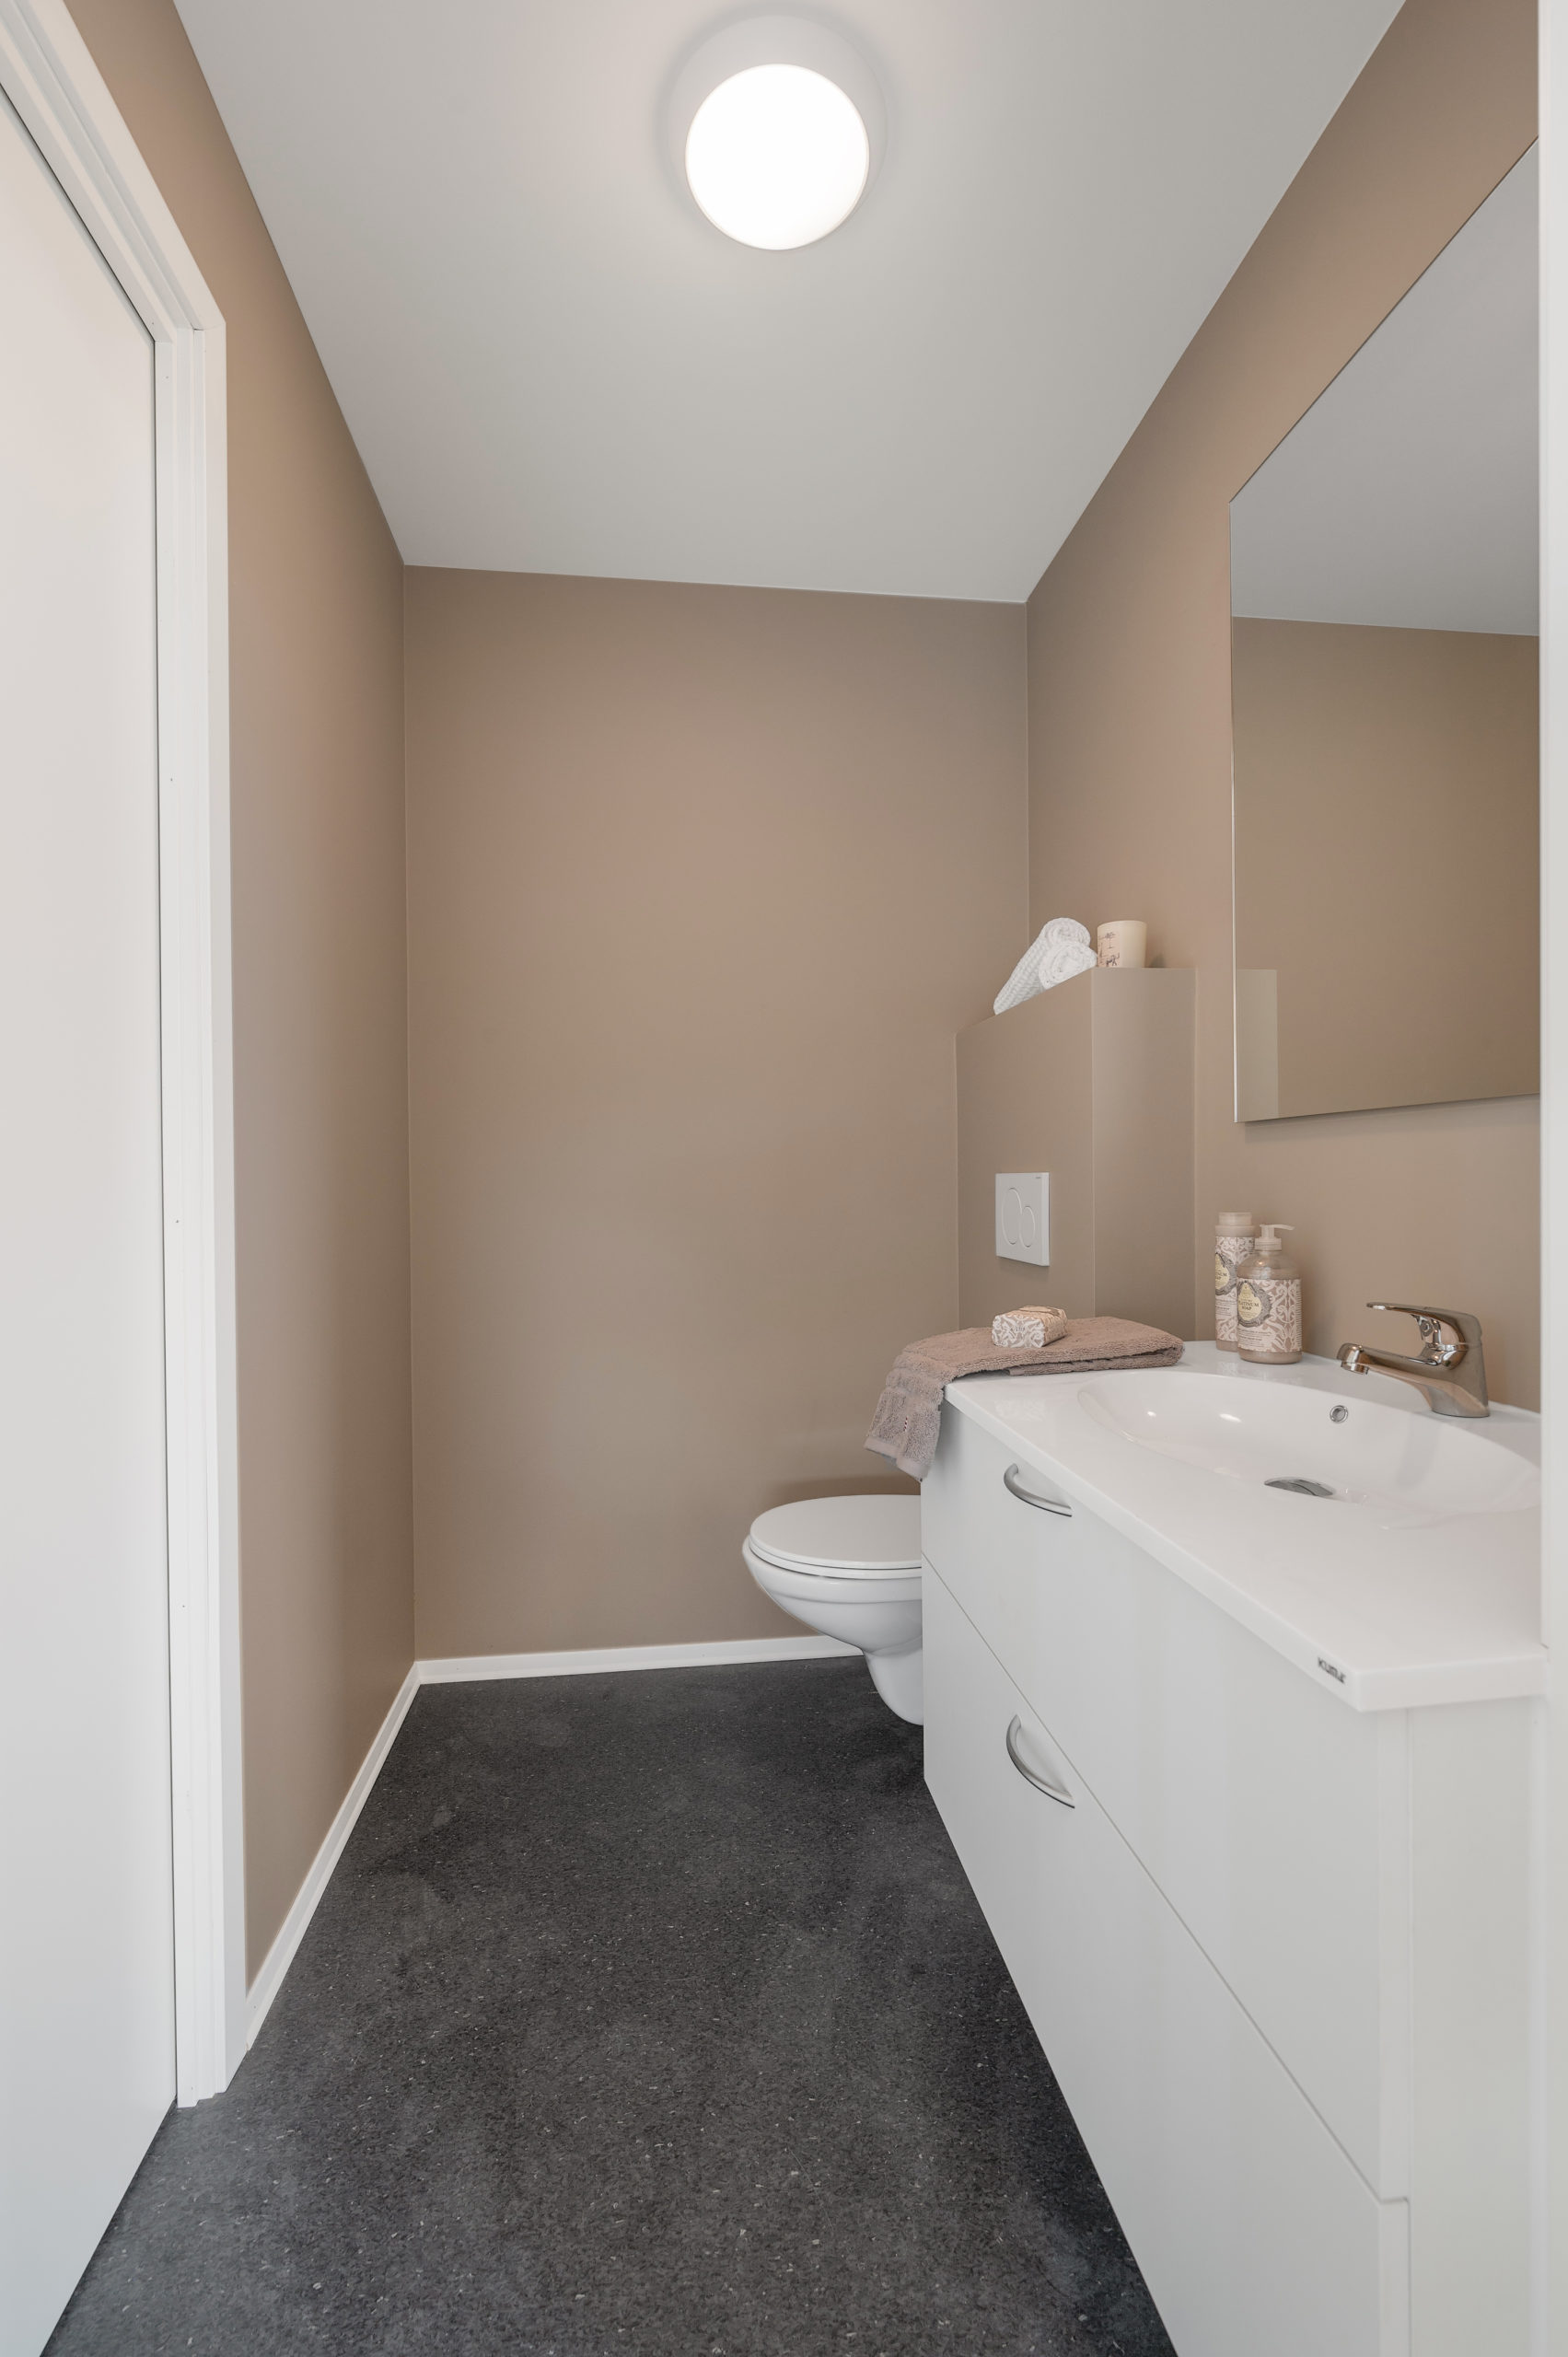 Enebolig Fjellfoten Hage: Bildet viser bad/WC i 2. etasje